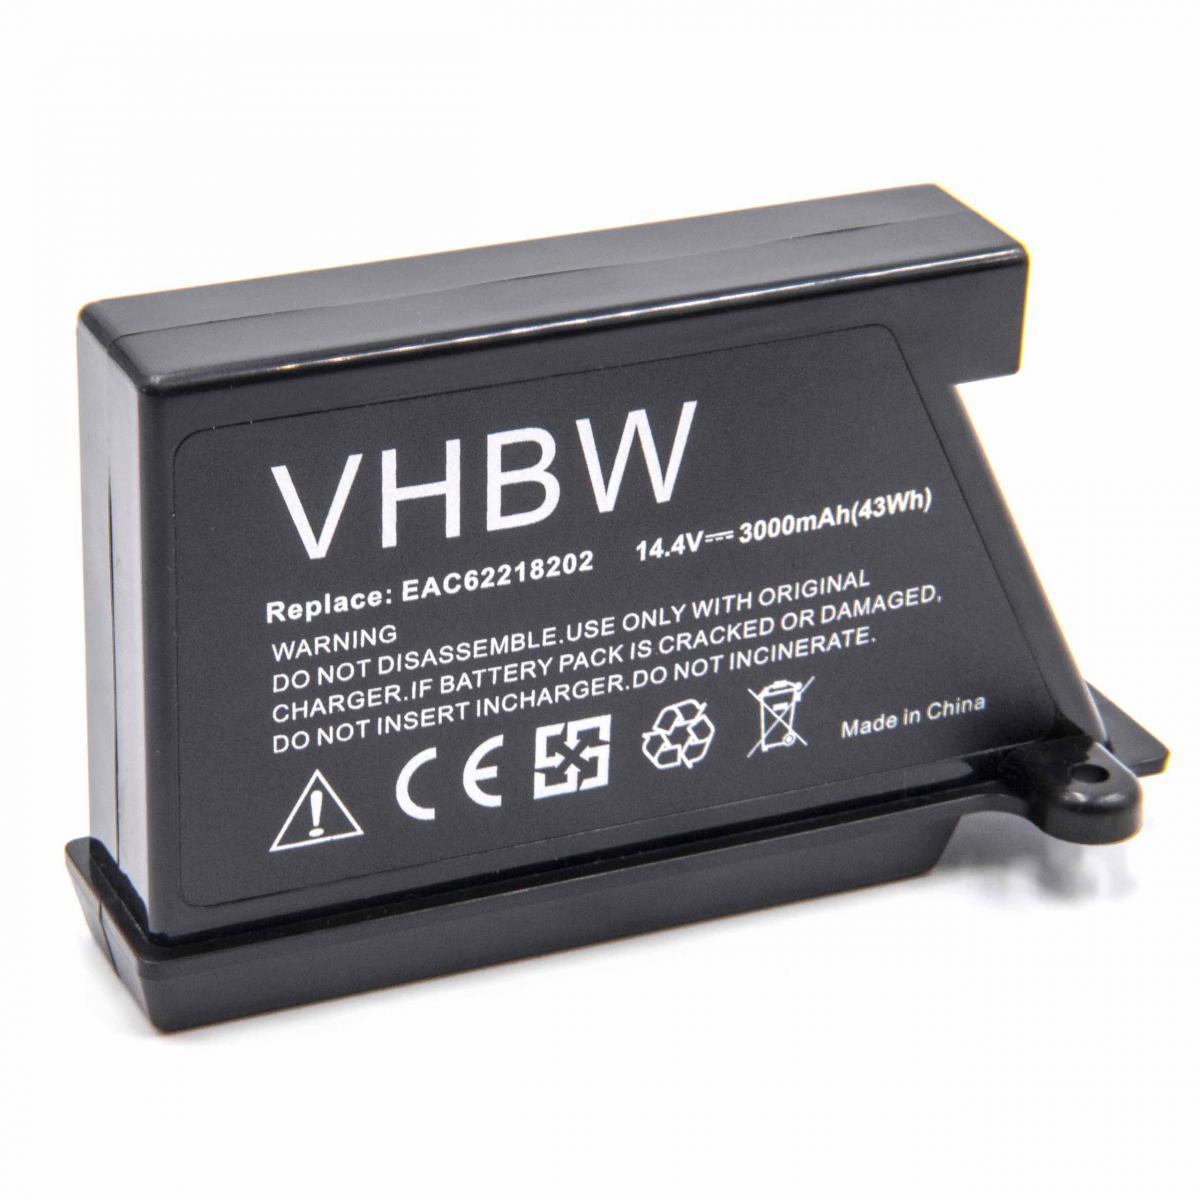 Vhbw vhbw Batterie compatible avec LG HOM-BOT Square, Turbo, VR1229RB, VR5001CM robot électroménager (3000mAh, 14,4V, Li-ion)